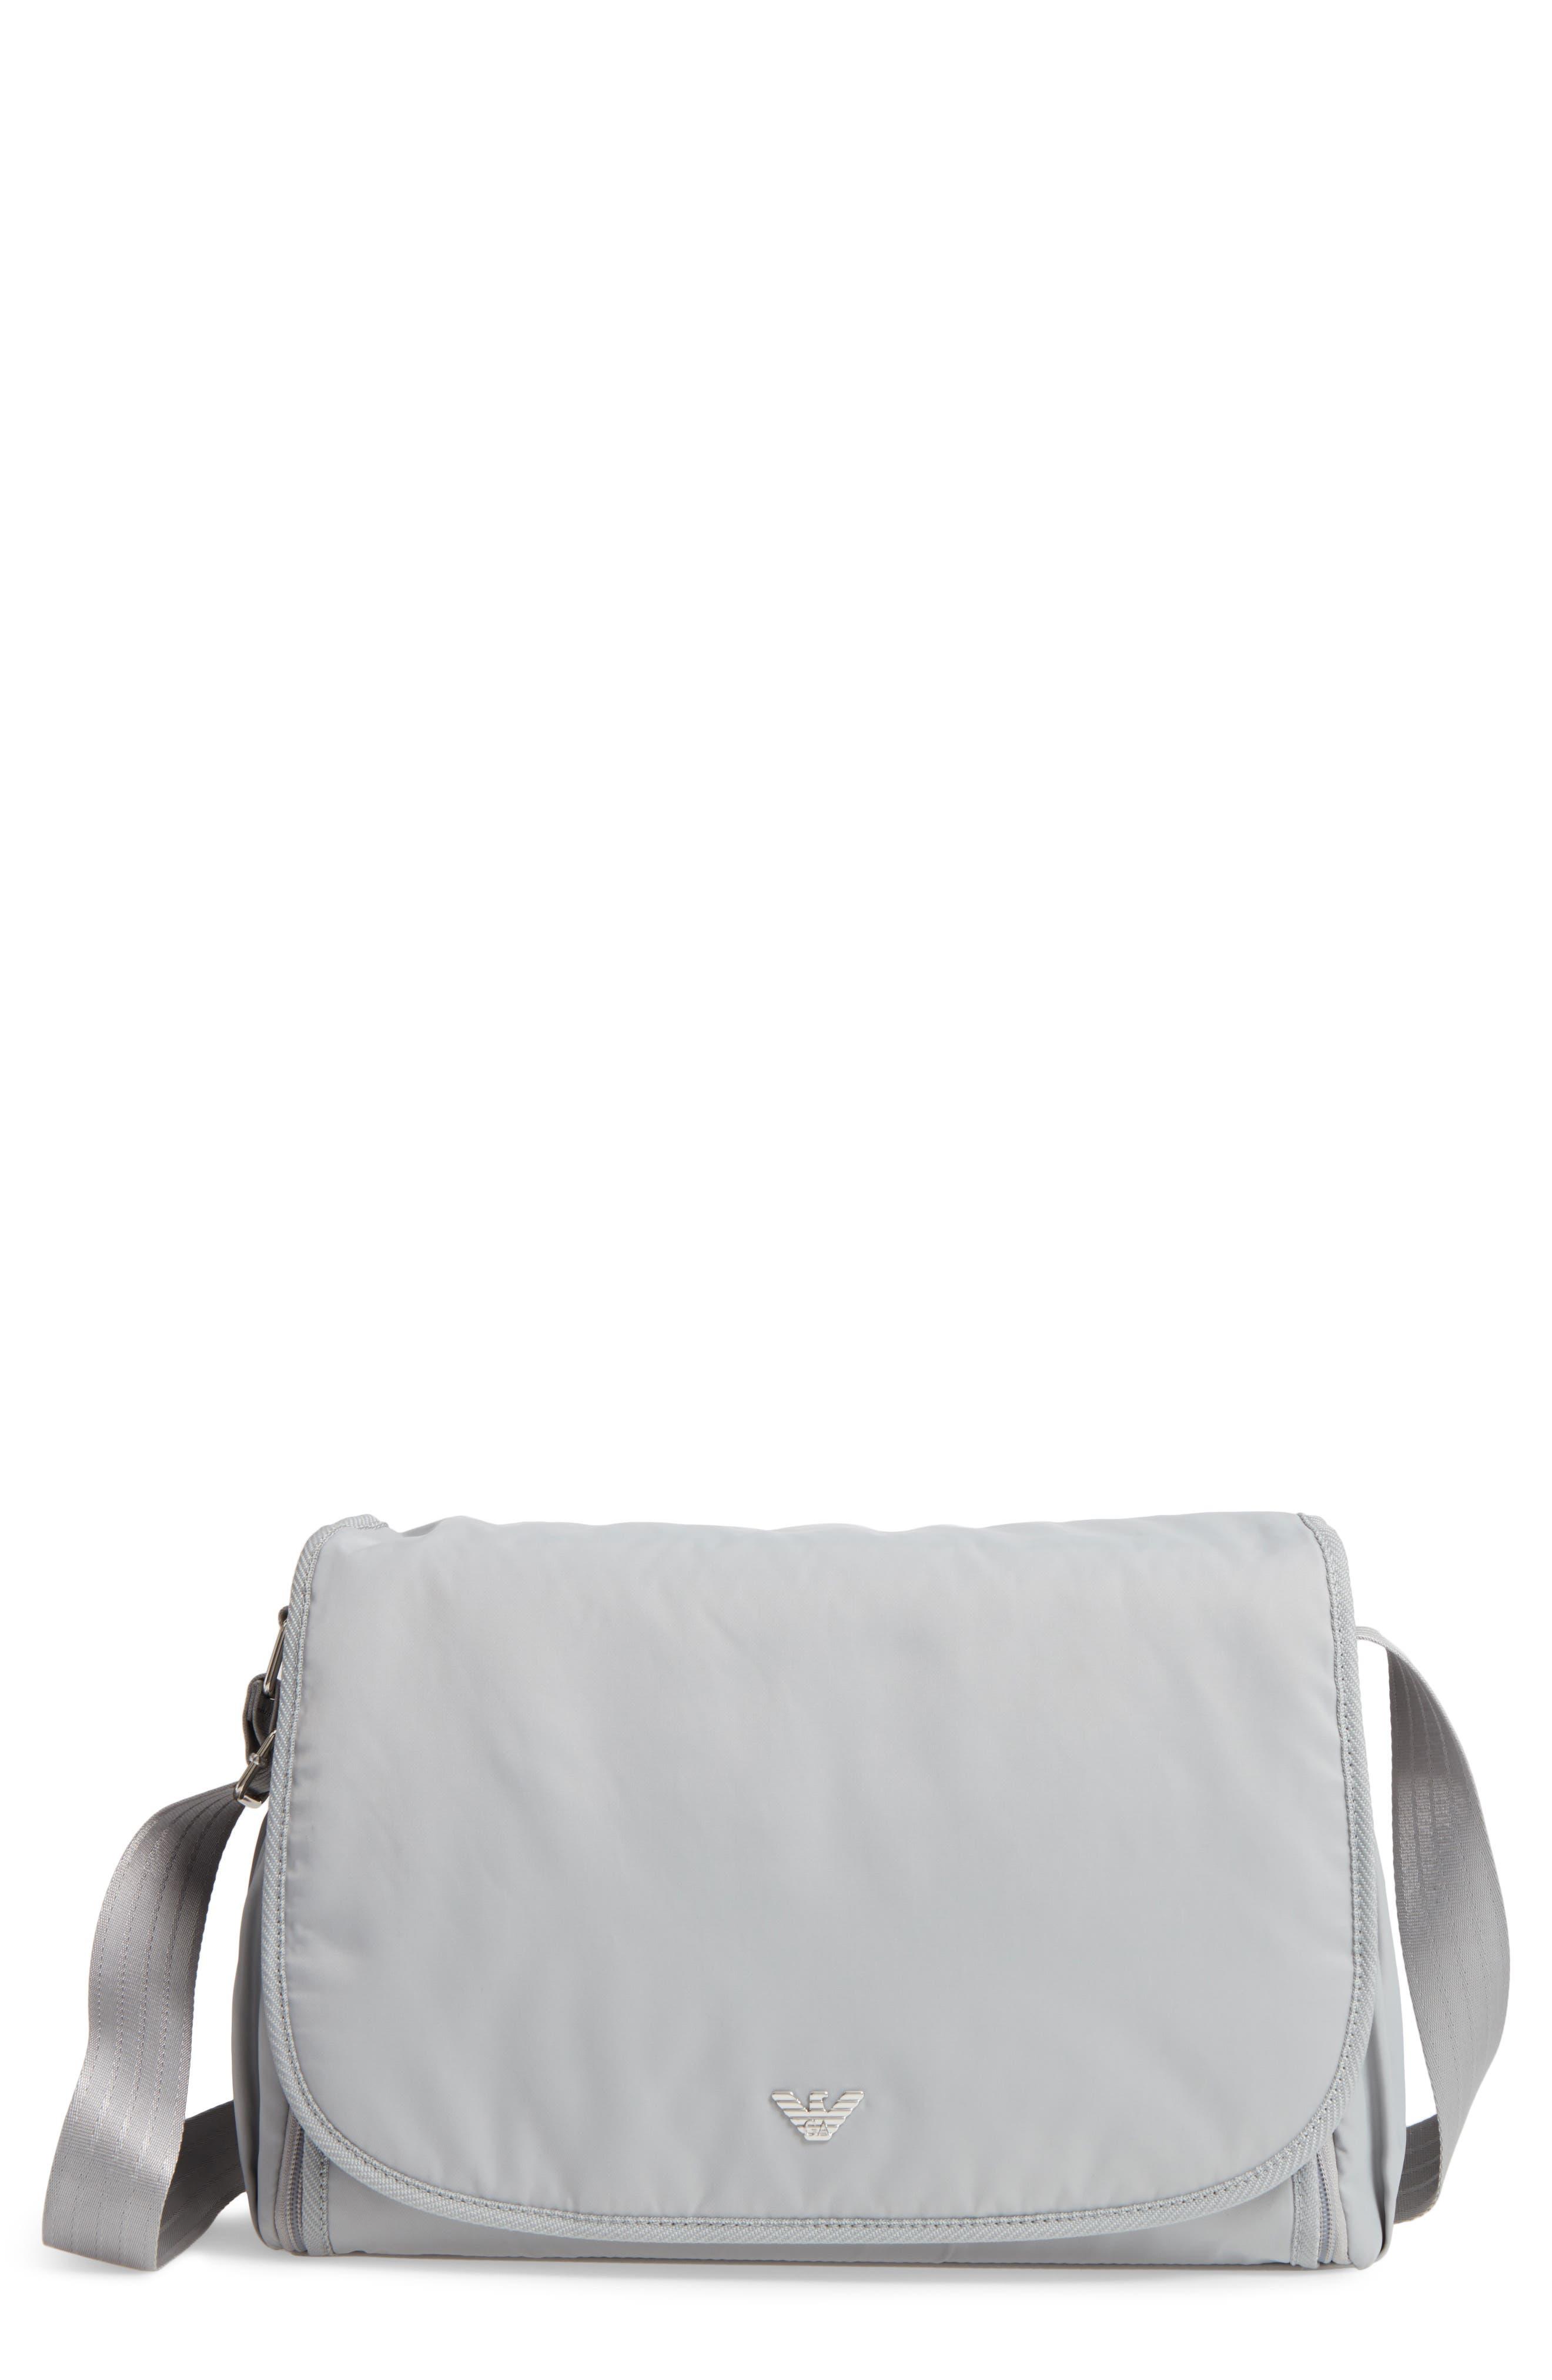 Nylon Messenger Diaper Bag,                             Main thumbnail 1, color,                             054